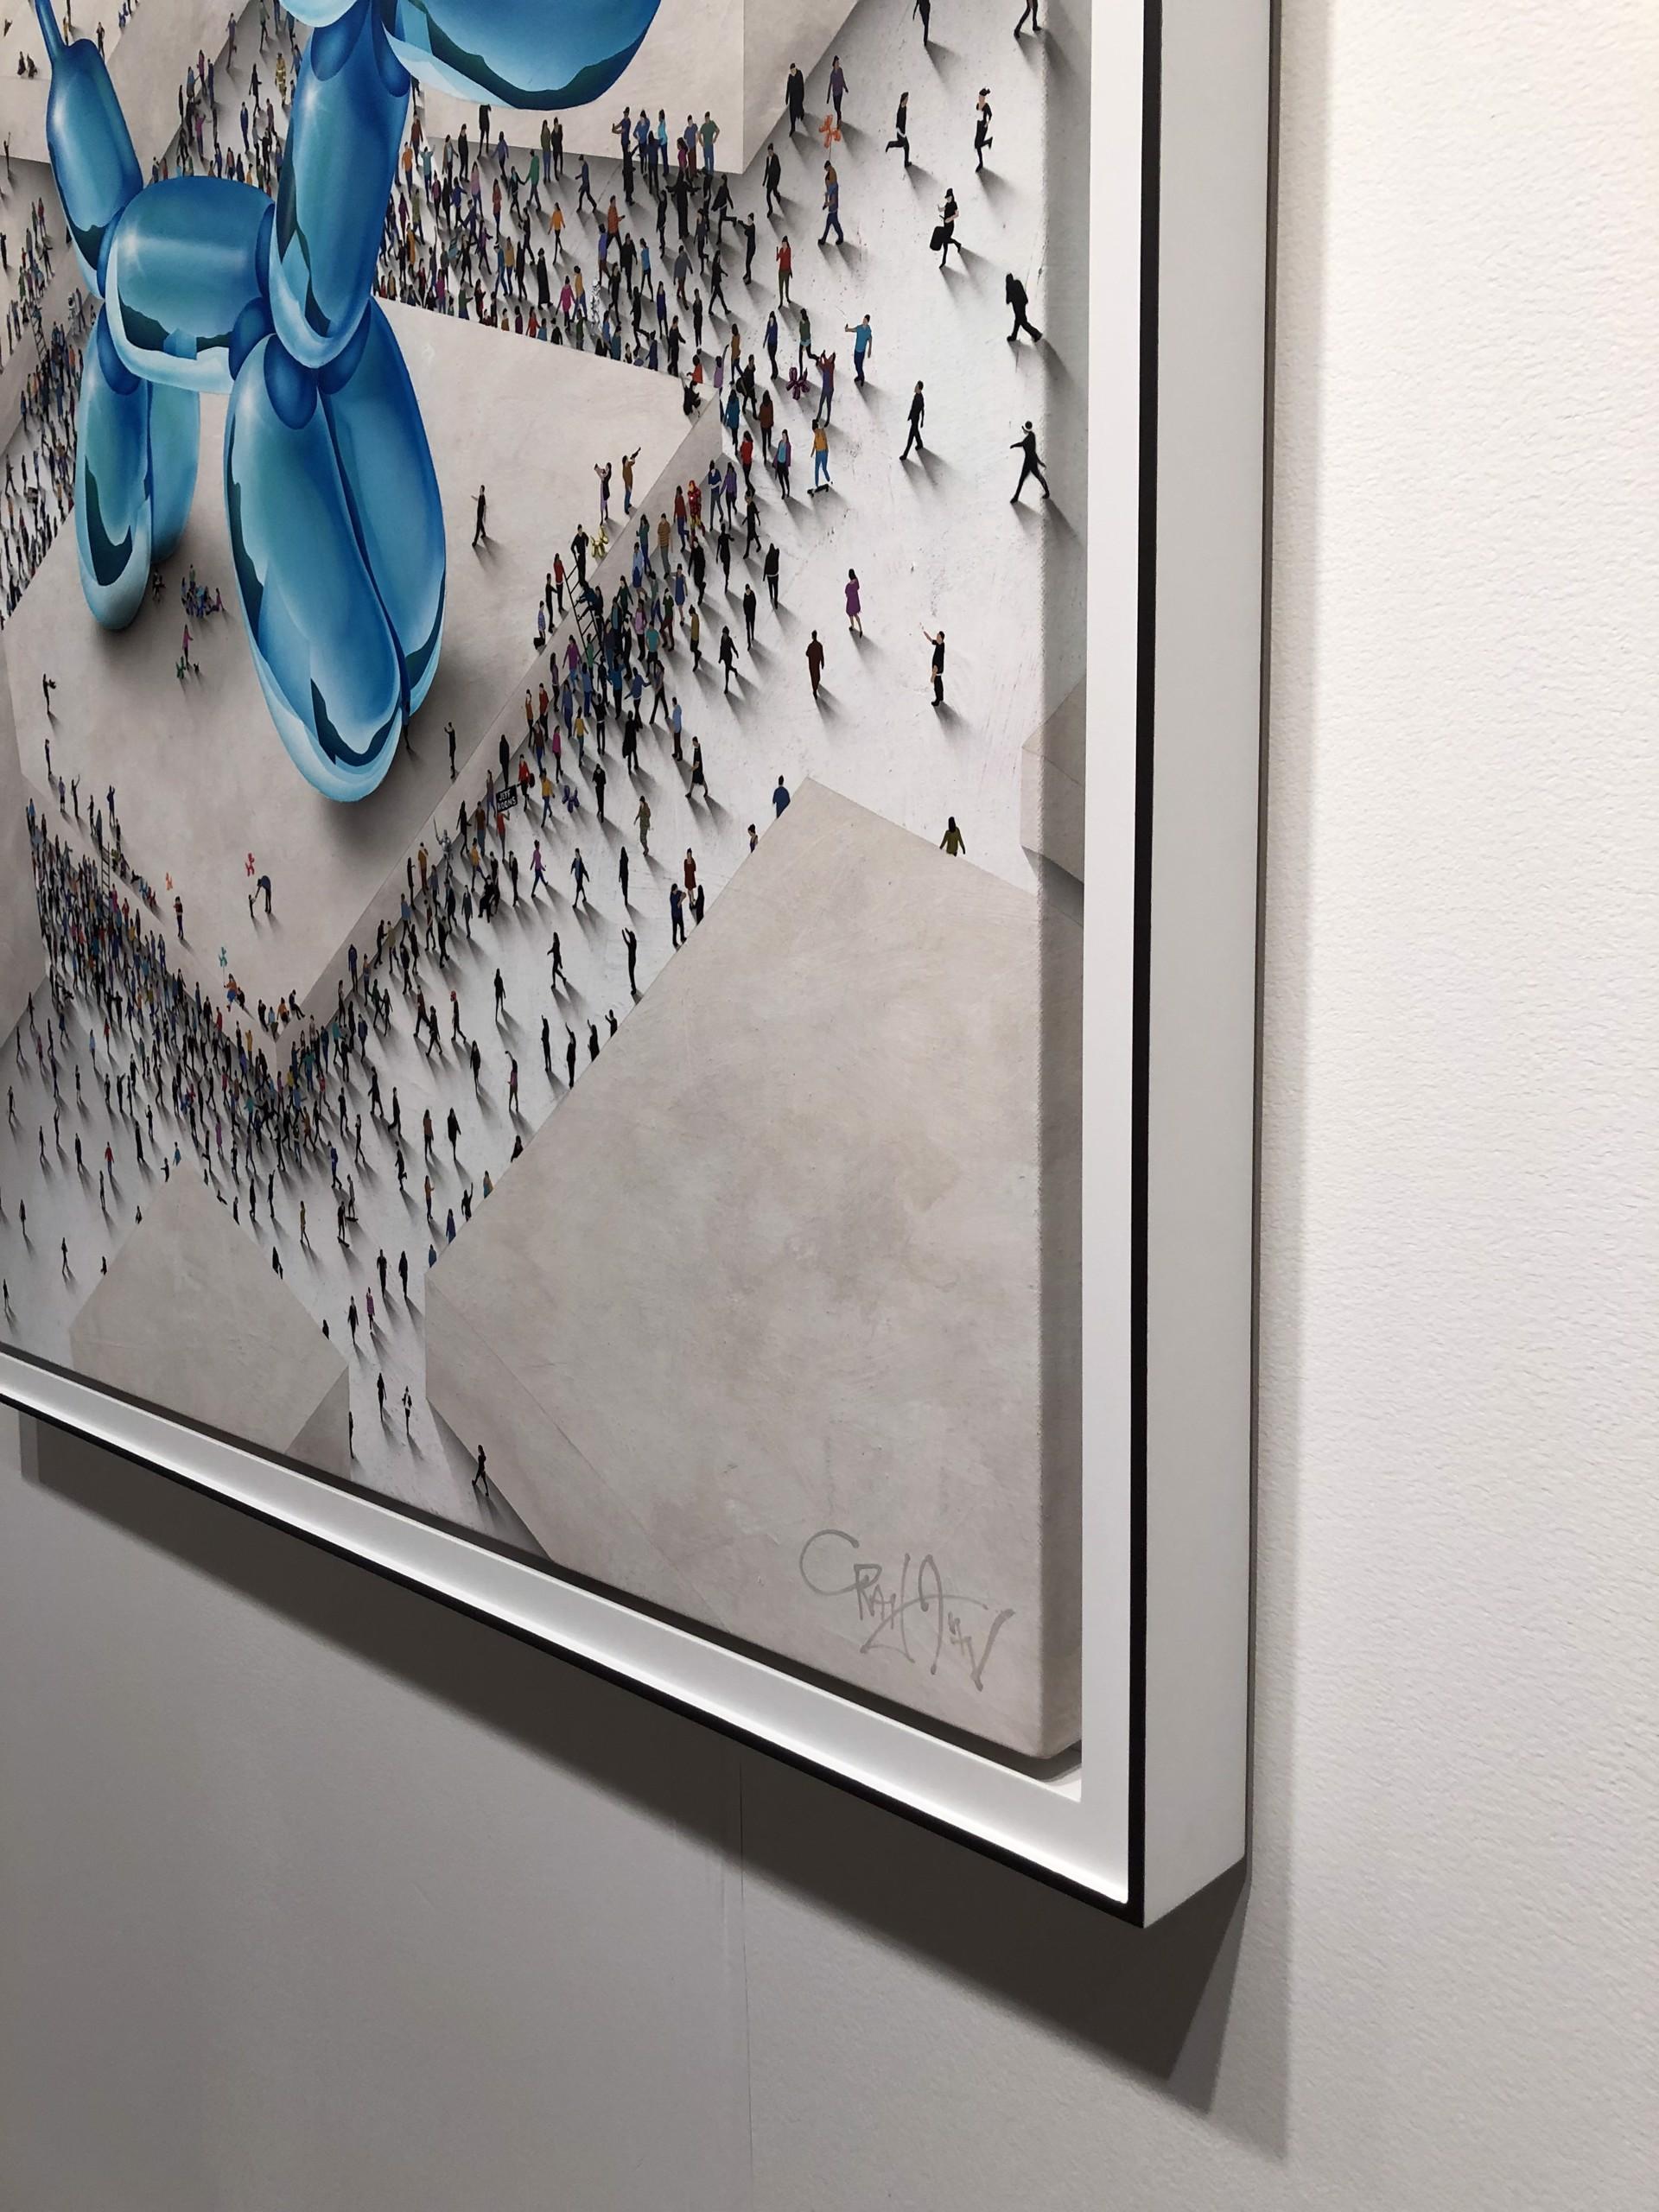 POPSTARS (Sold) by Craig Alan, Populus Homage